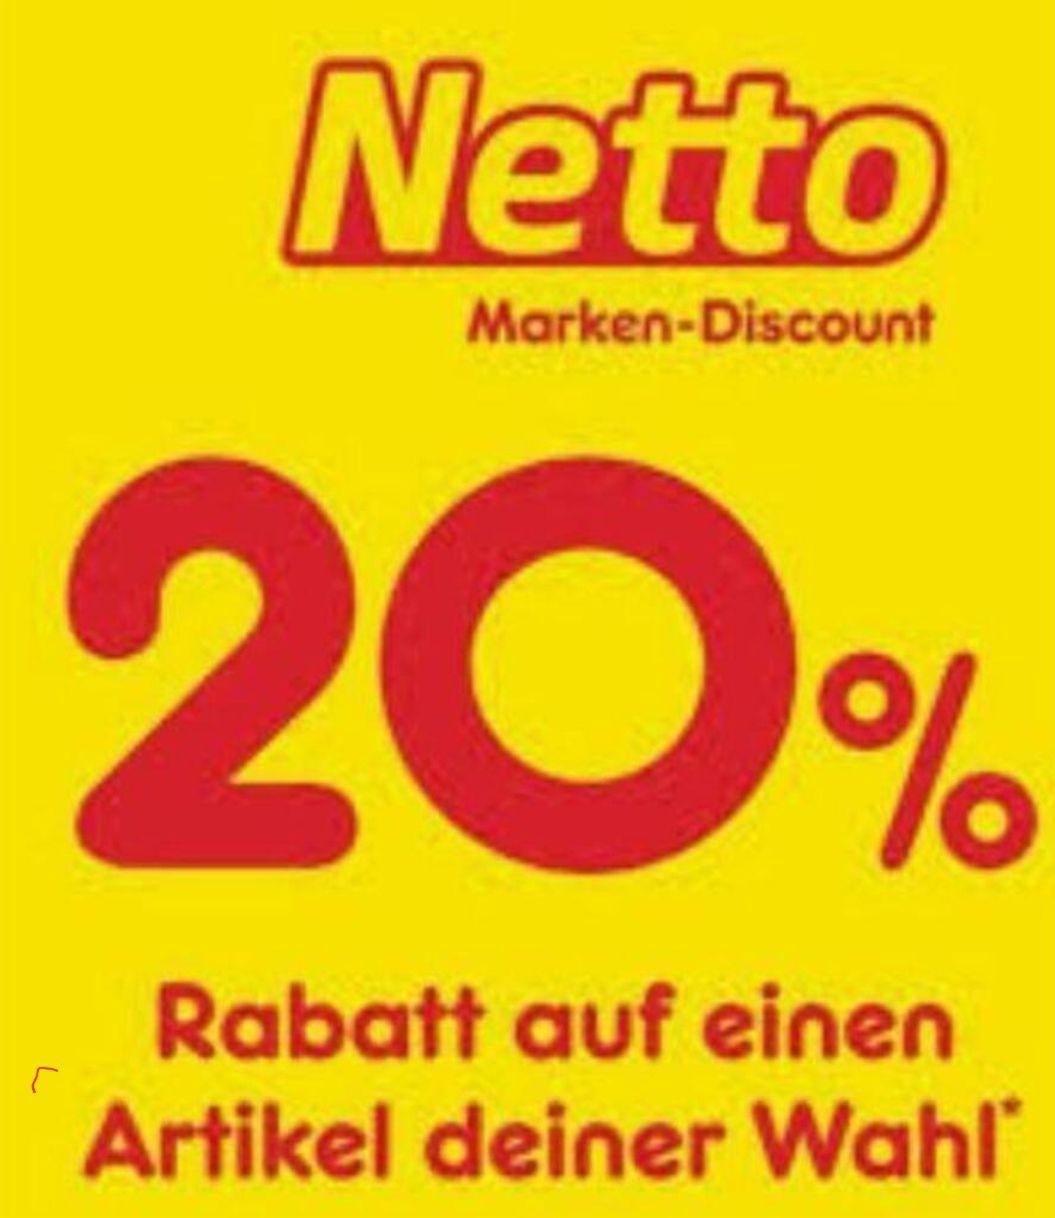 [Netto MD] Rabatt Coupons KW6 (08.02. - 13.02.), bundesweit einsetzbar